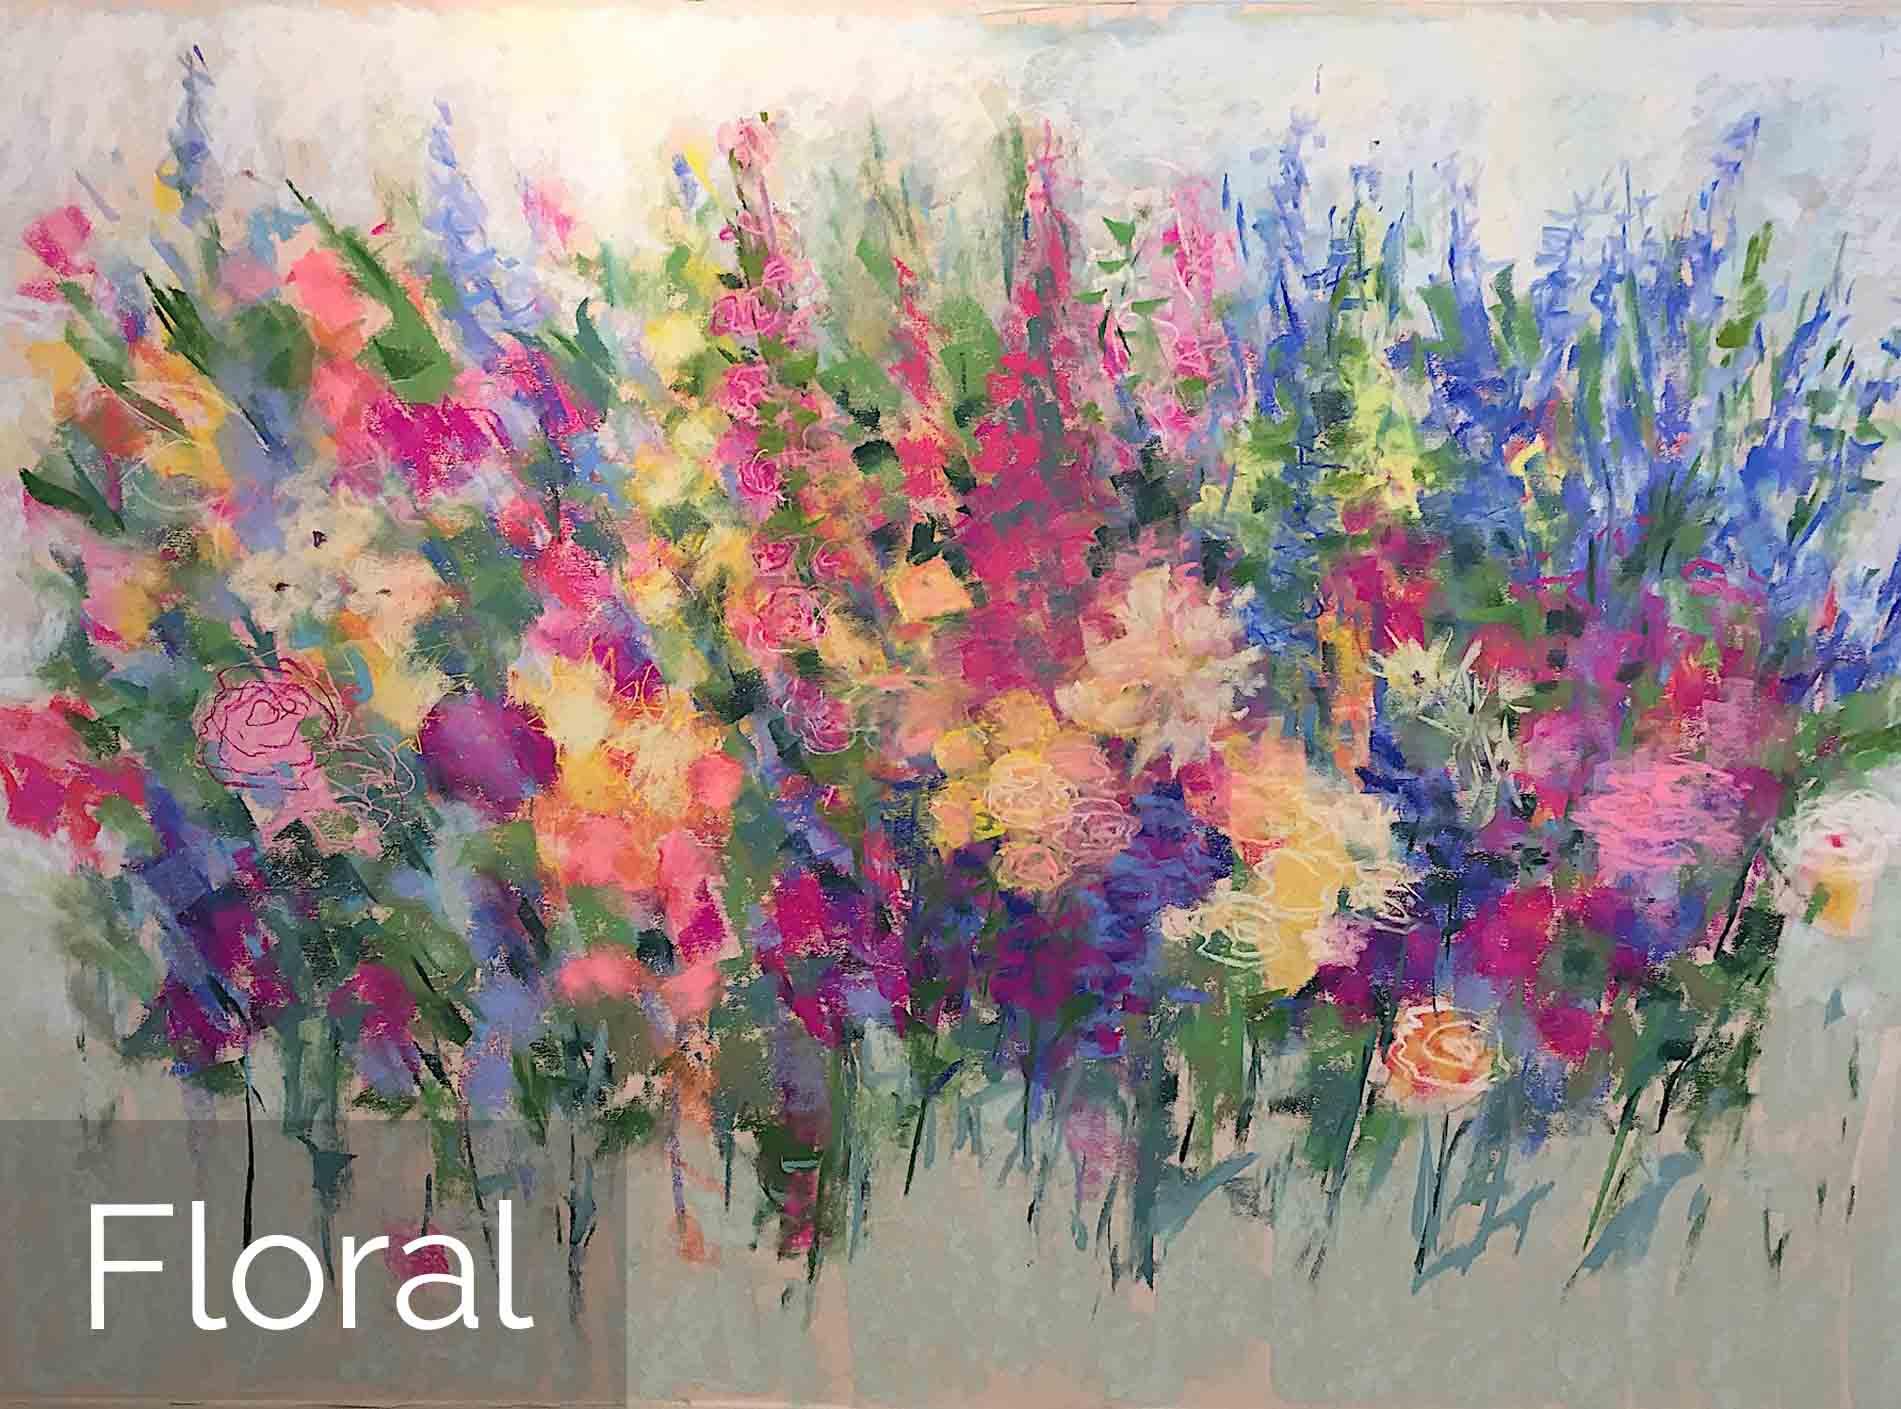 Michèle J. Kenna Floral Paintings for Sale - Pastel